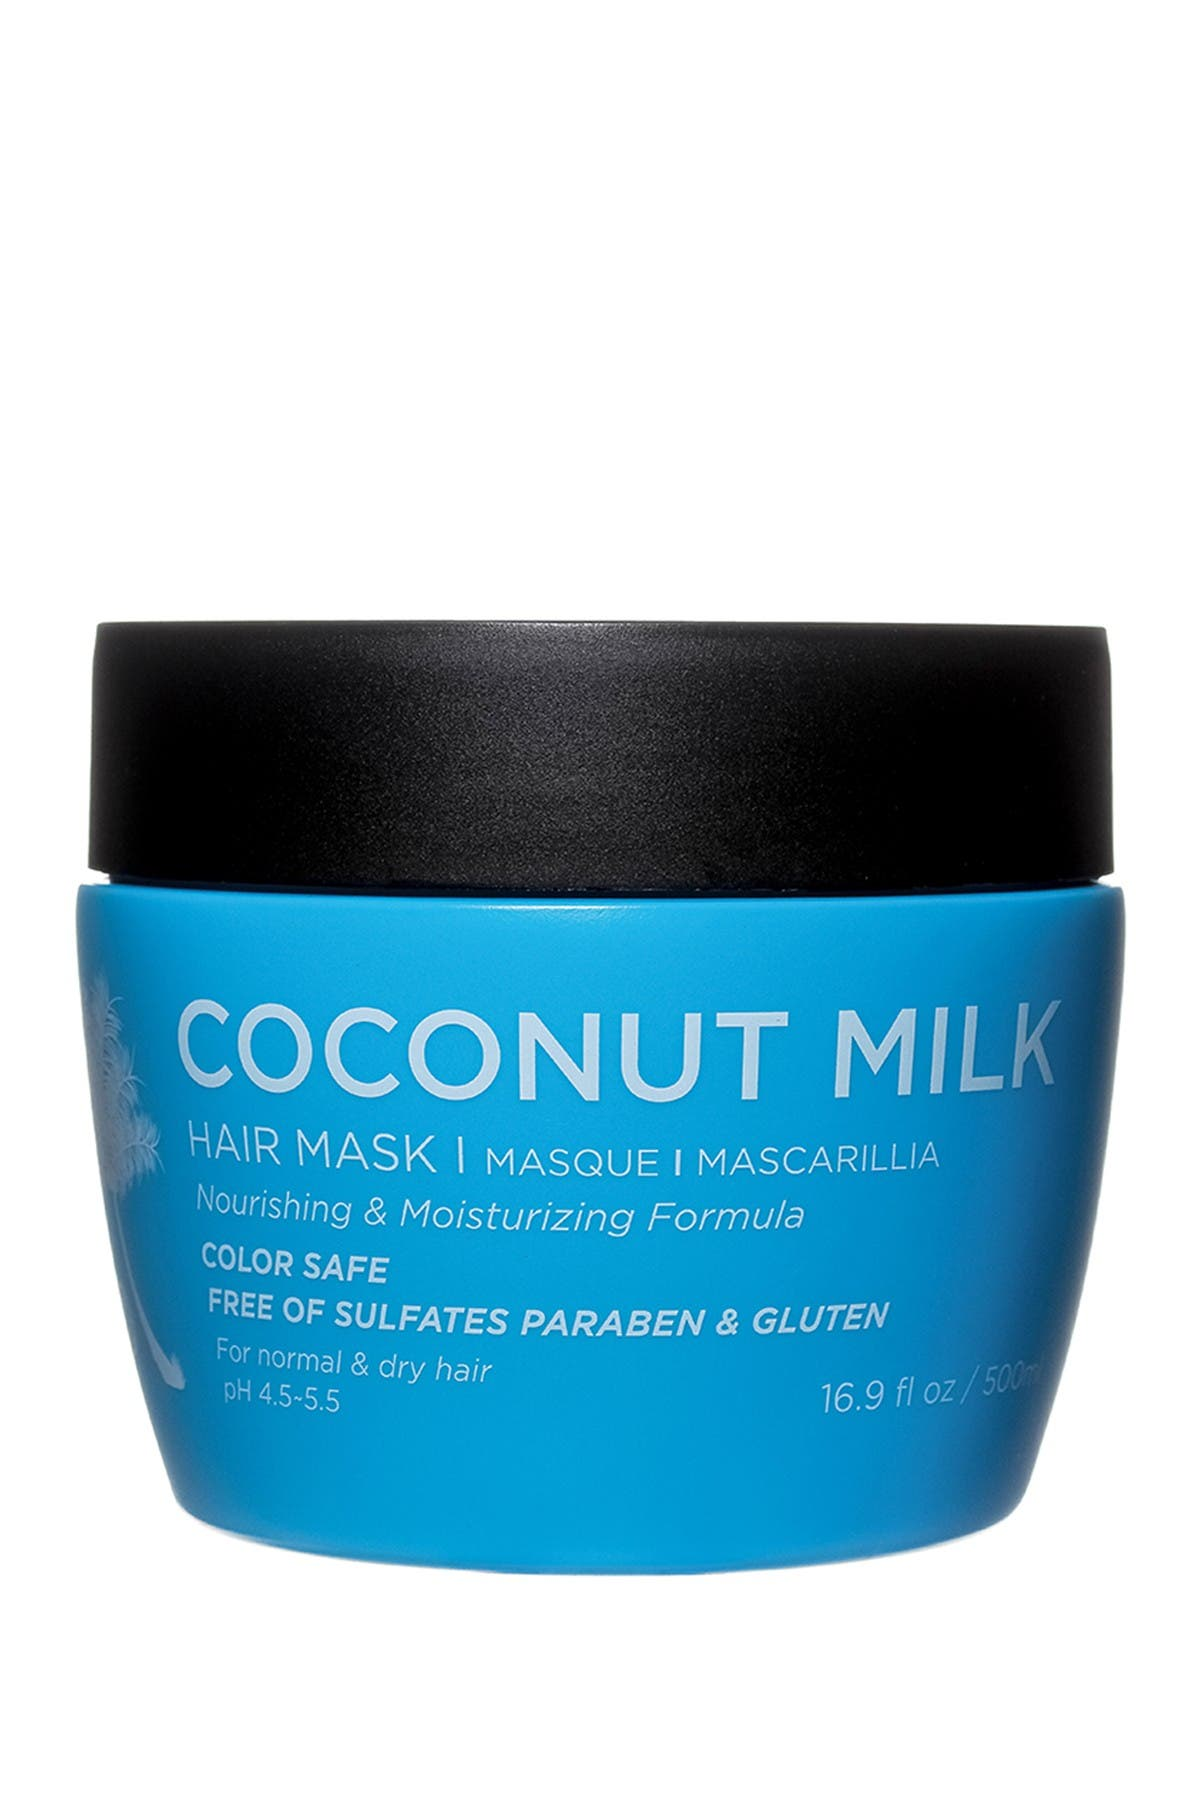 Image of Luseta Beauty Coconut Milk Hair Mask - 16.9 oz.